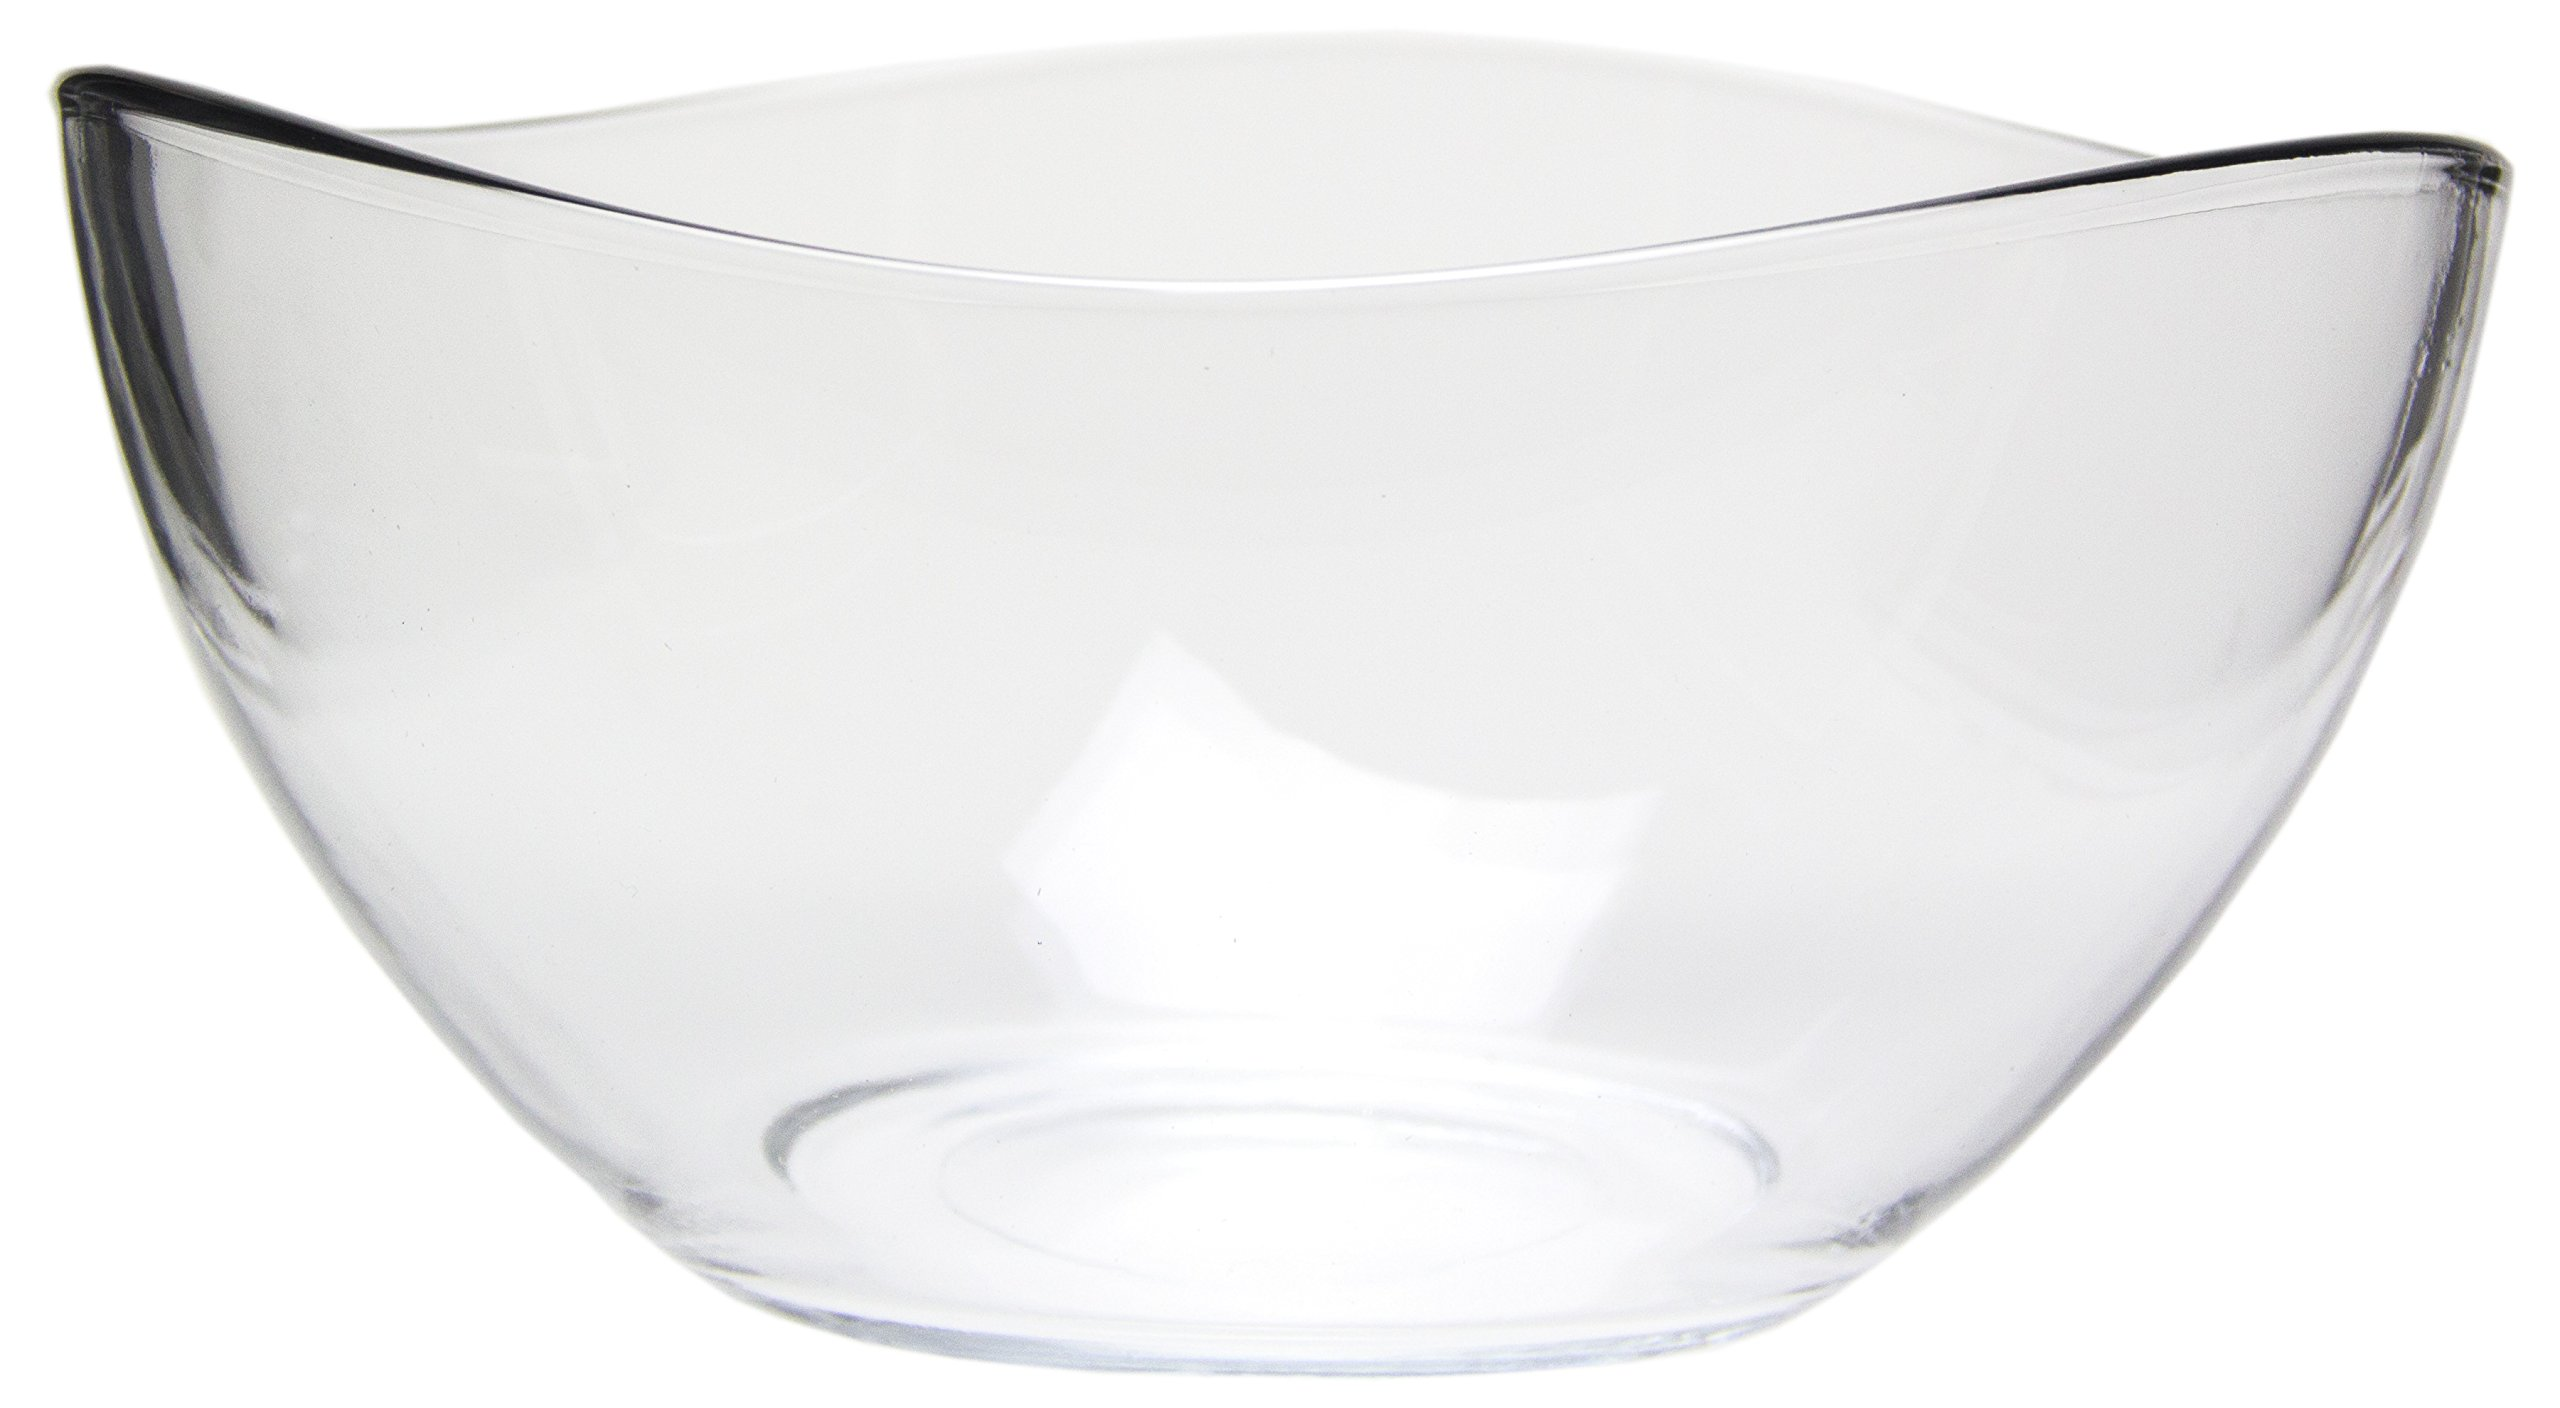 Medium Clear Glass Wavy Serving/Mixing Bowl, 63.5 oz